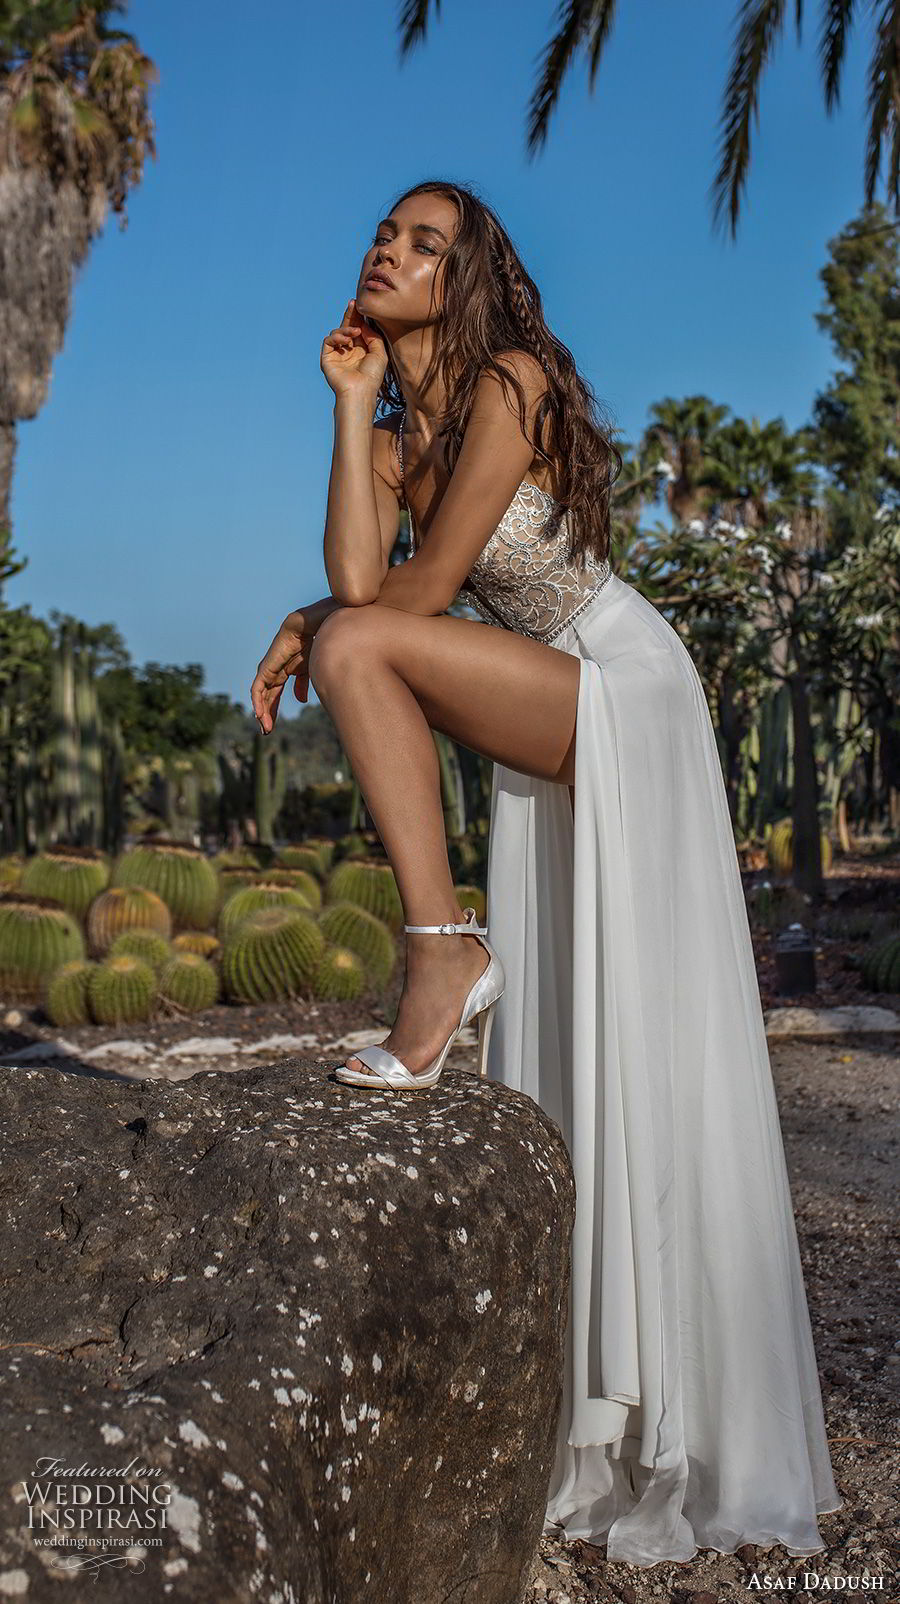 asaf dadush 2018 bridal spaghetti strap deep plunging sweetheart neckline heavily embellised bodice double slit slirt romantic soft a  line wedding dress open strap back sweep train (10) sdv